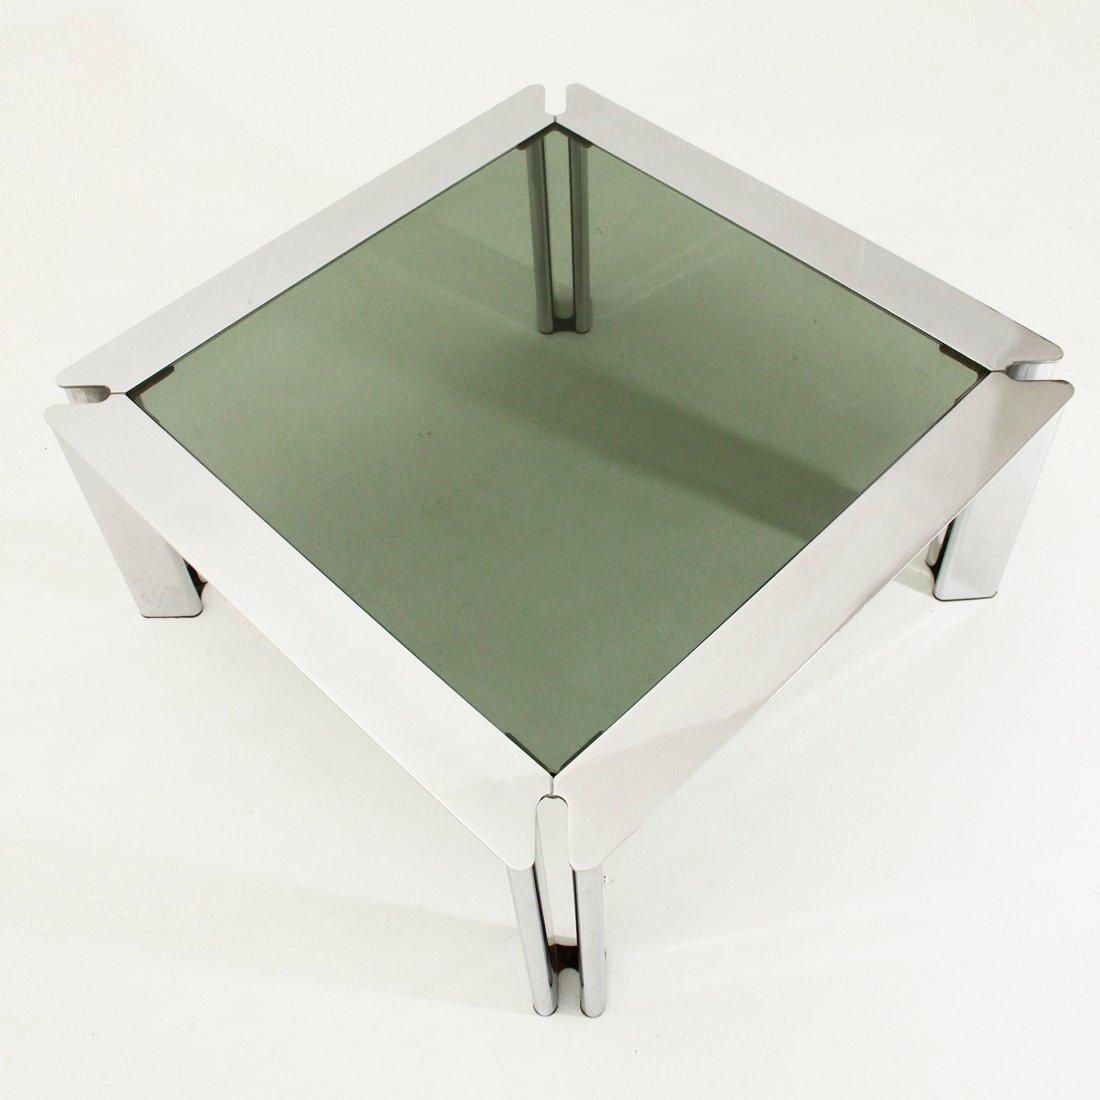 verchromter quadratischer italienischer metall couchtisch bei pamono kaufen. Black Bedroom Furniture Sets. Home Design Ideas